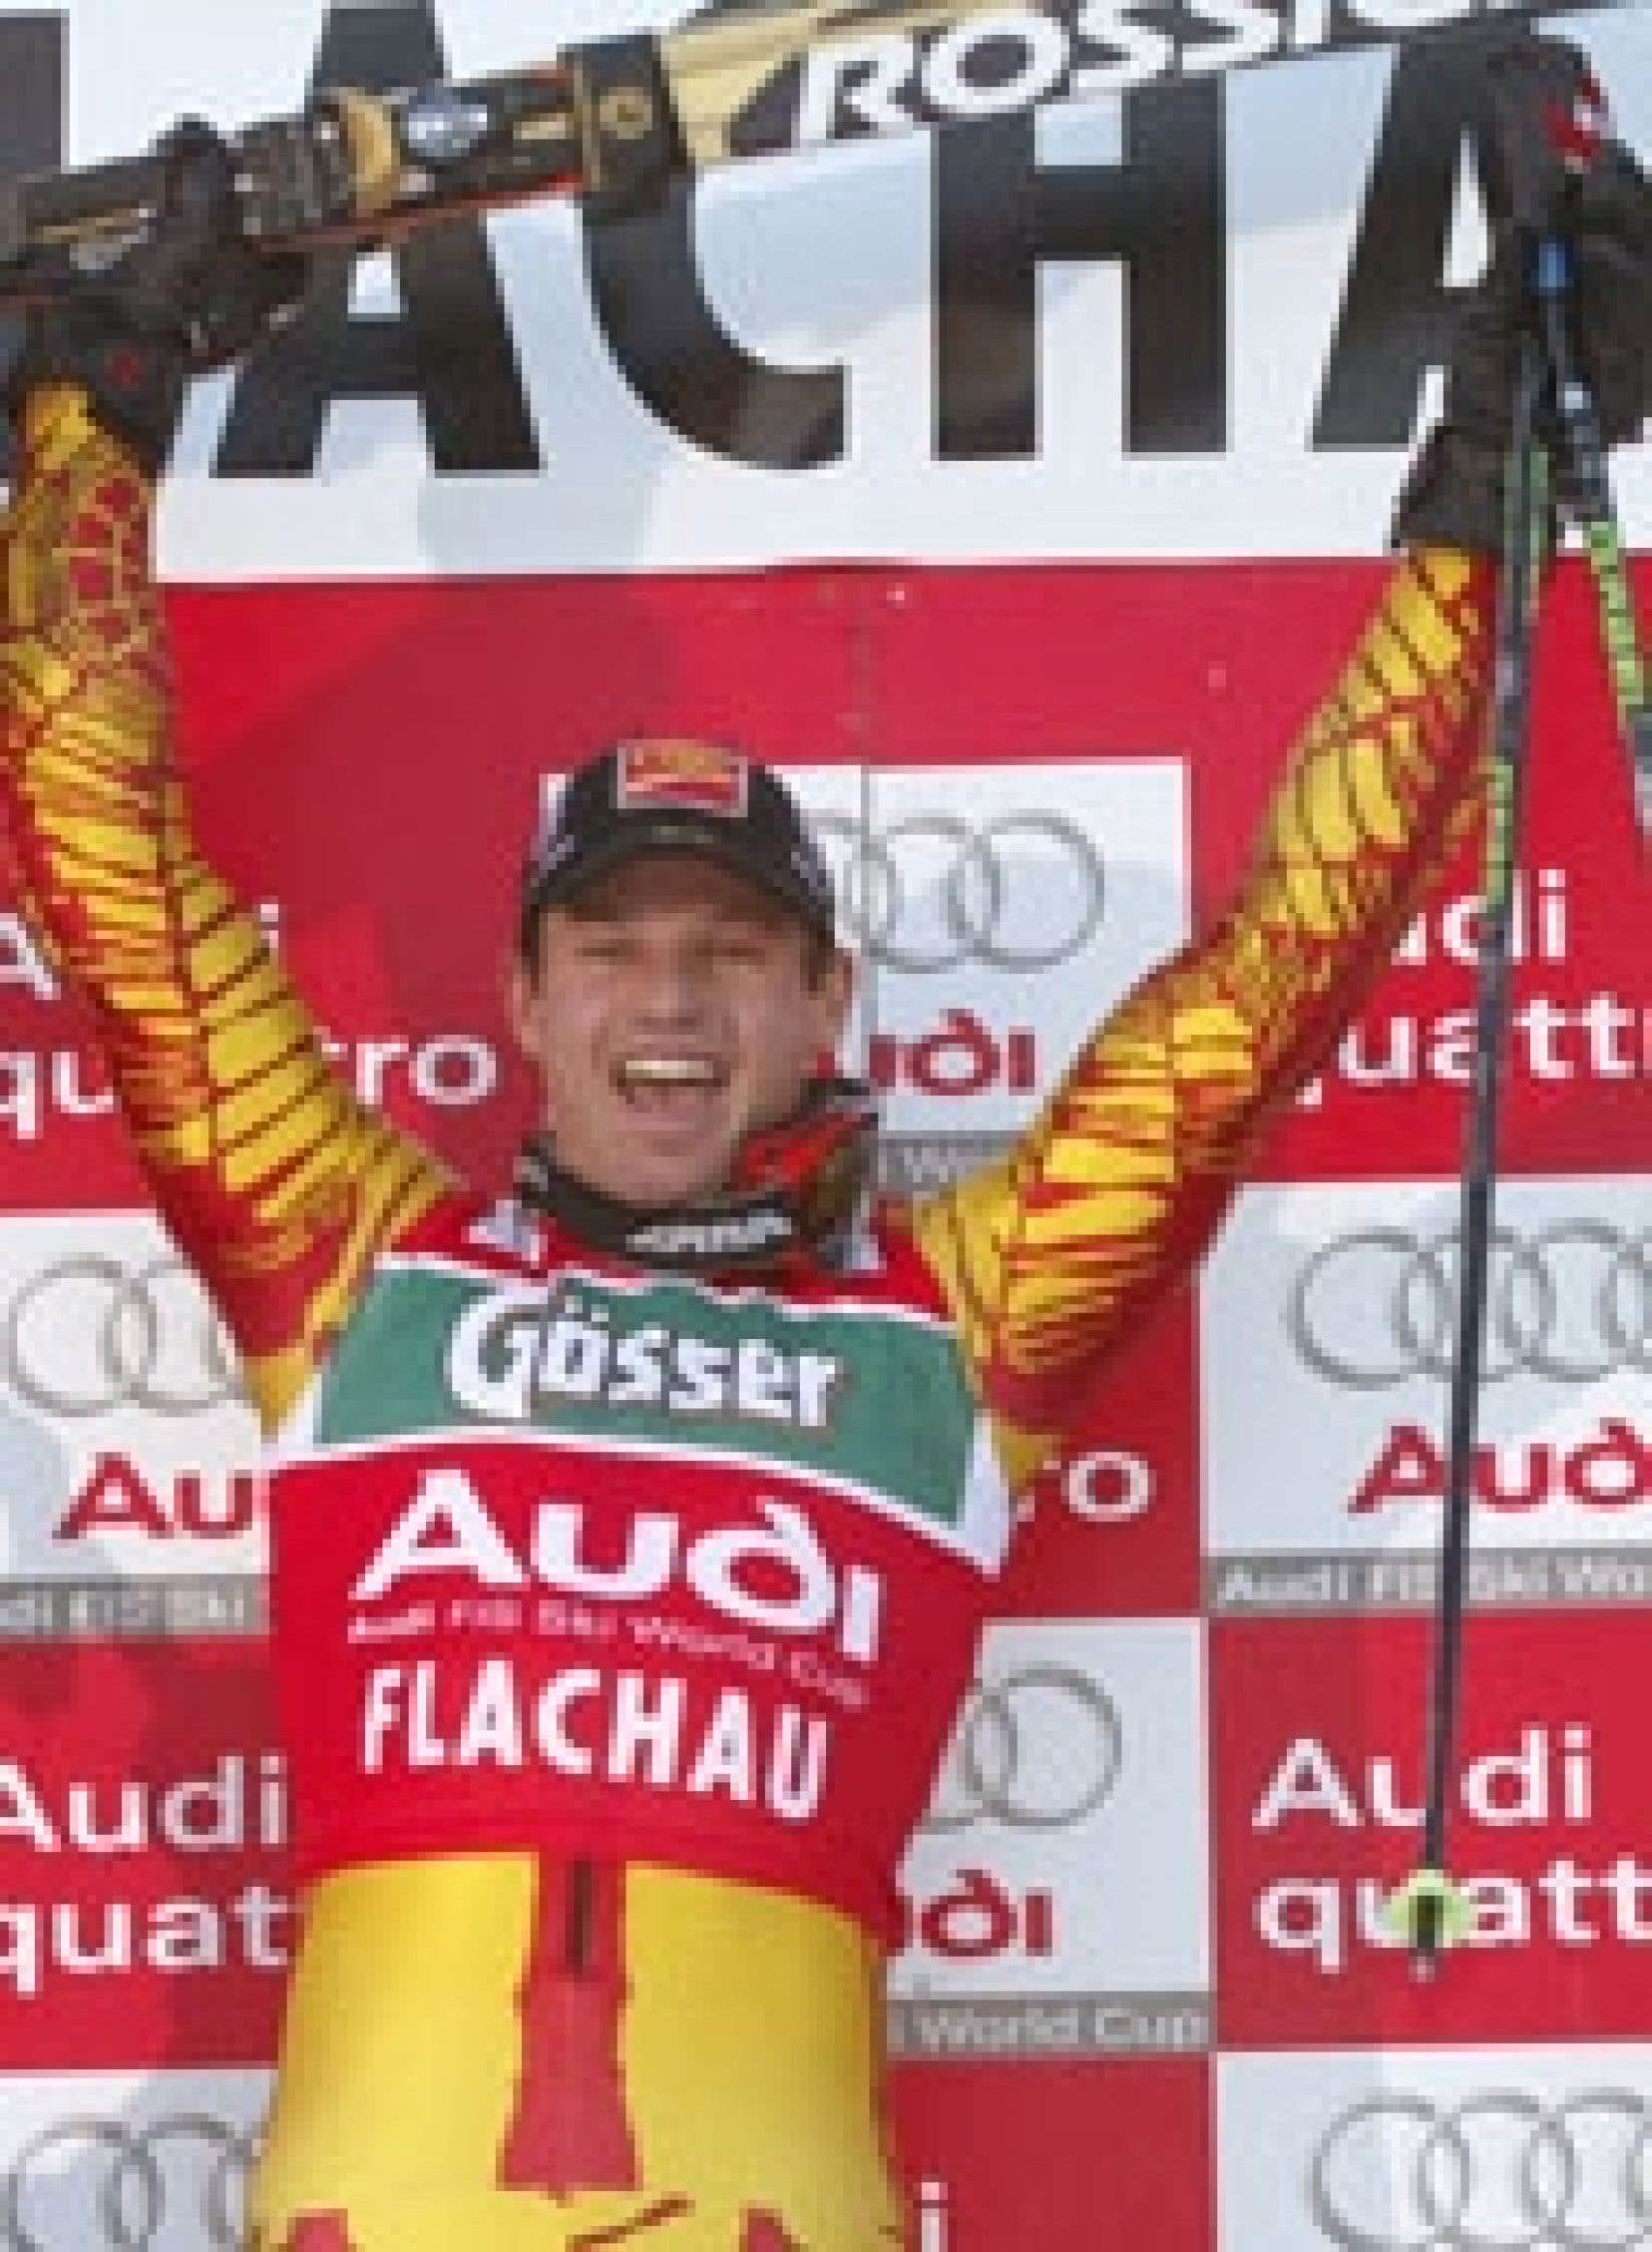 Thomas Grandi célébrant sa victoire d'hier à Flachau, en Autriche.